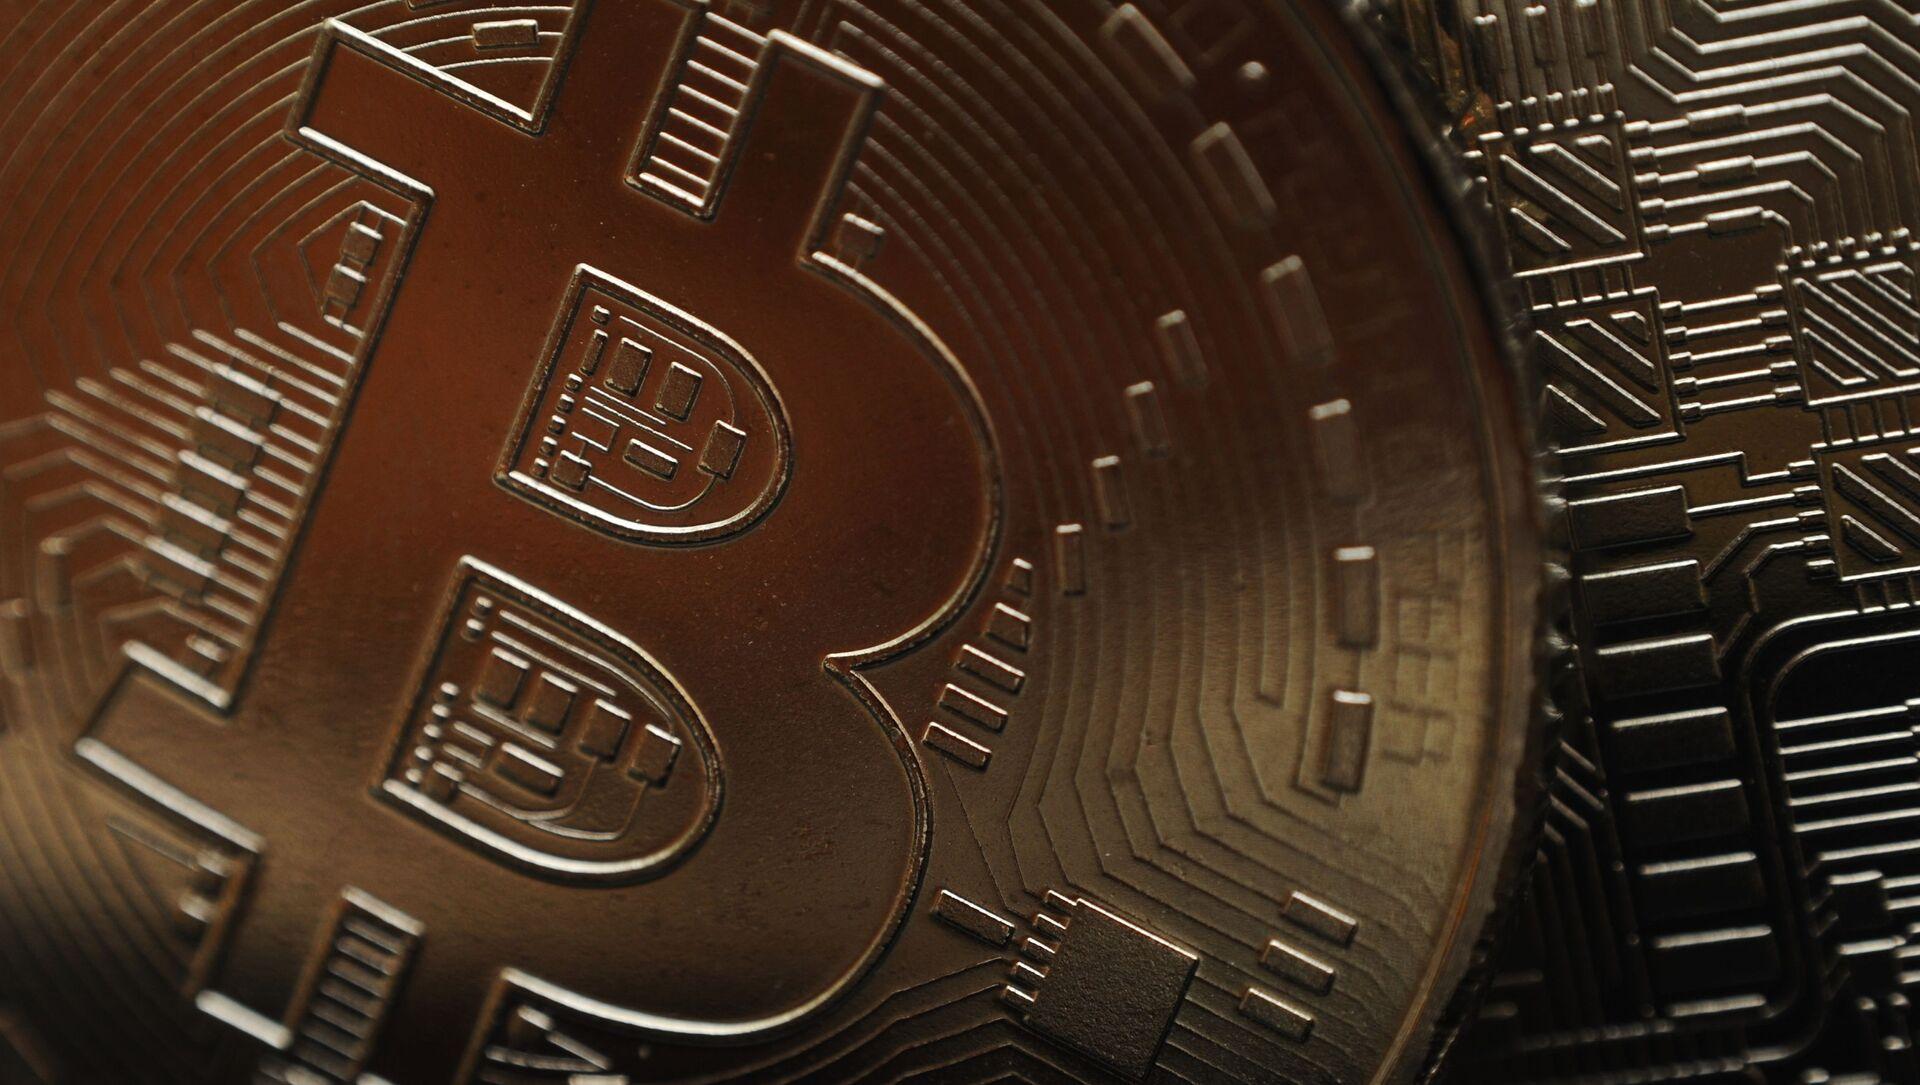 Le bitcoin - Sputnik France, 1920, 01.02.2021